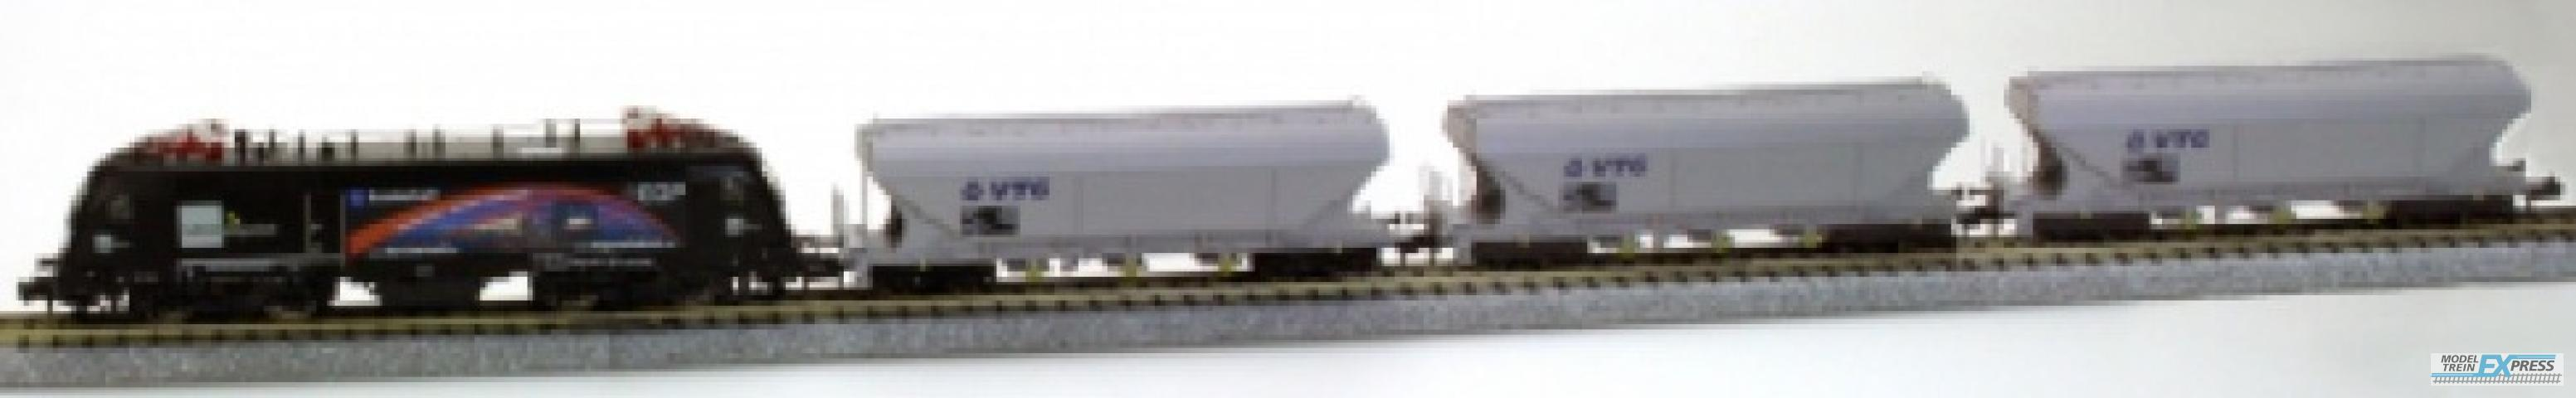 Hobbytrain 5007